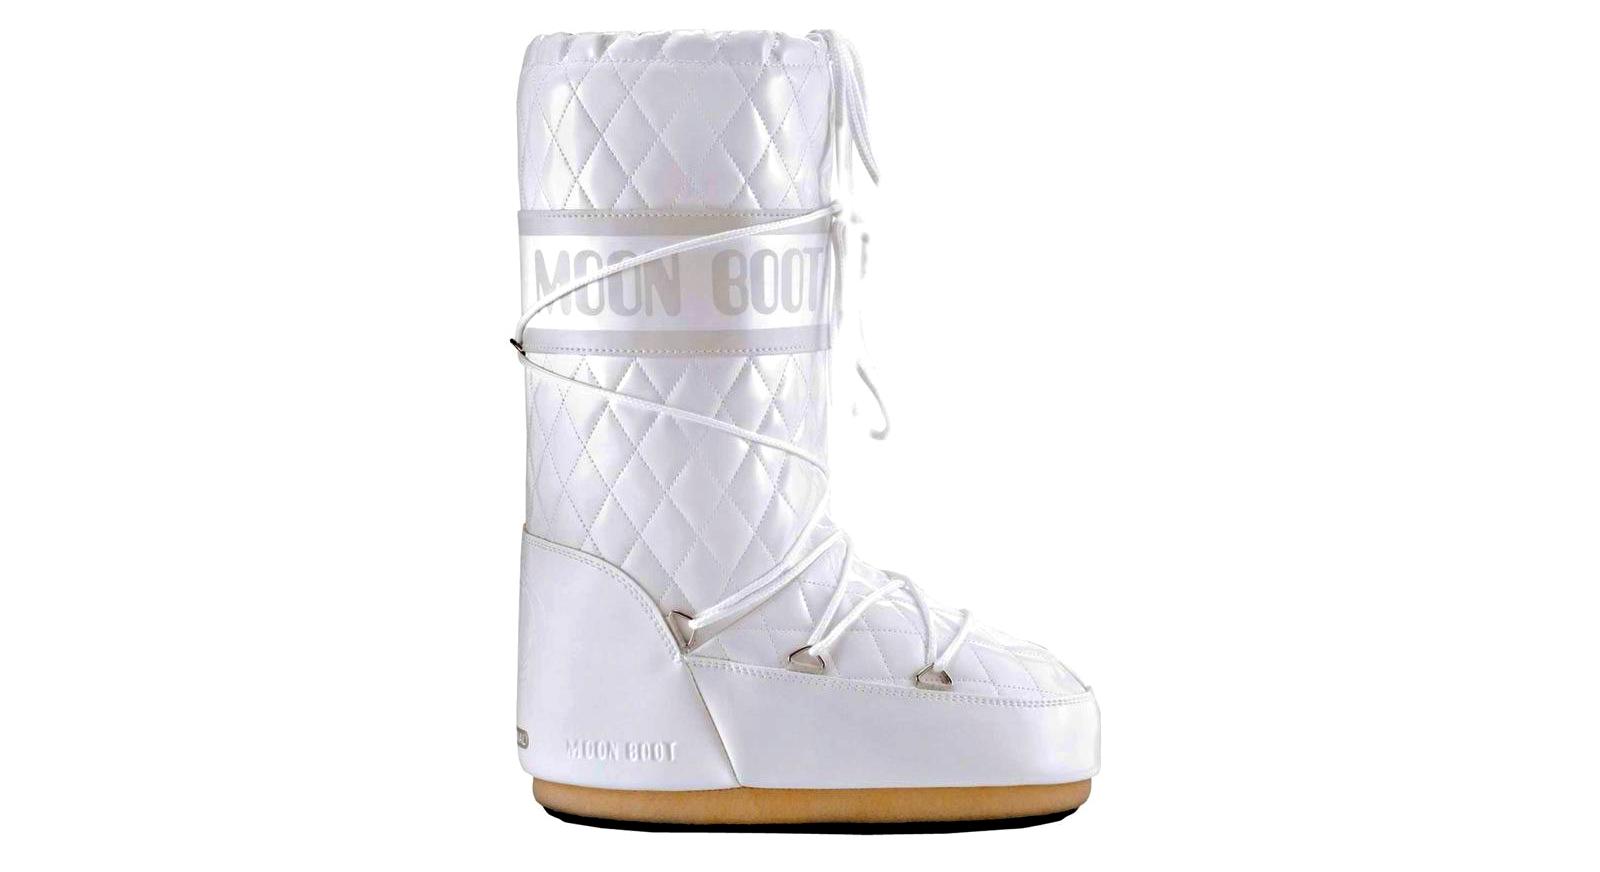 Lo scarpone Moon Boot Total White, esposto al MoMA